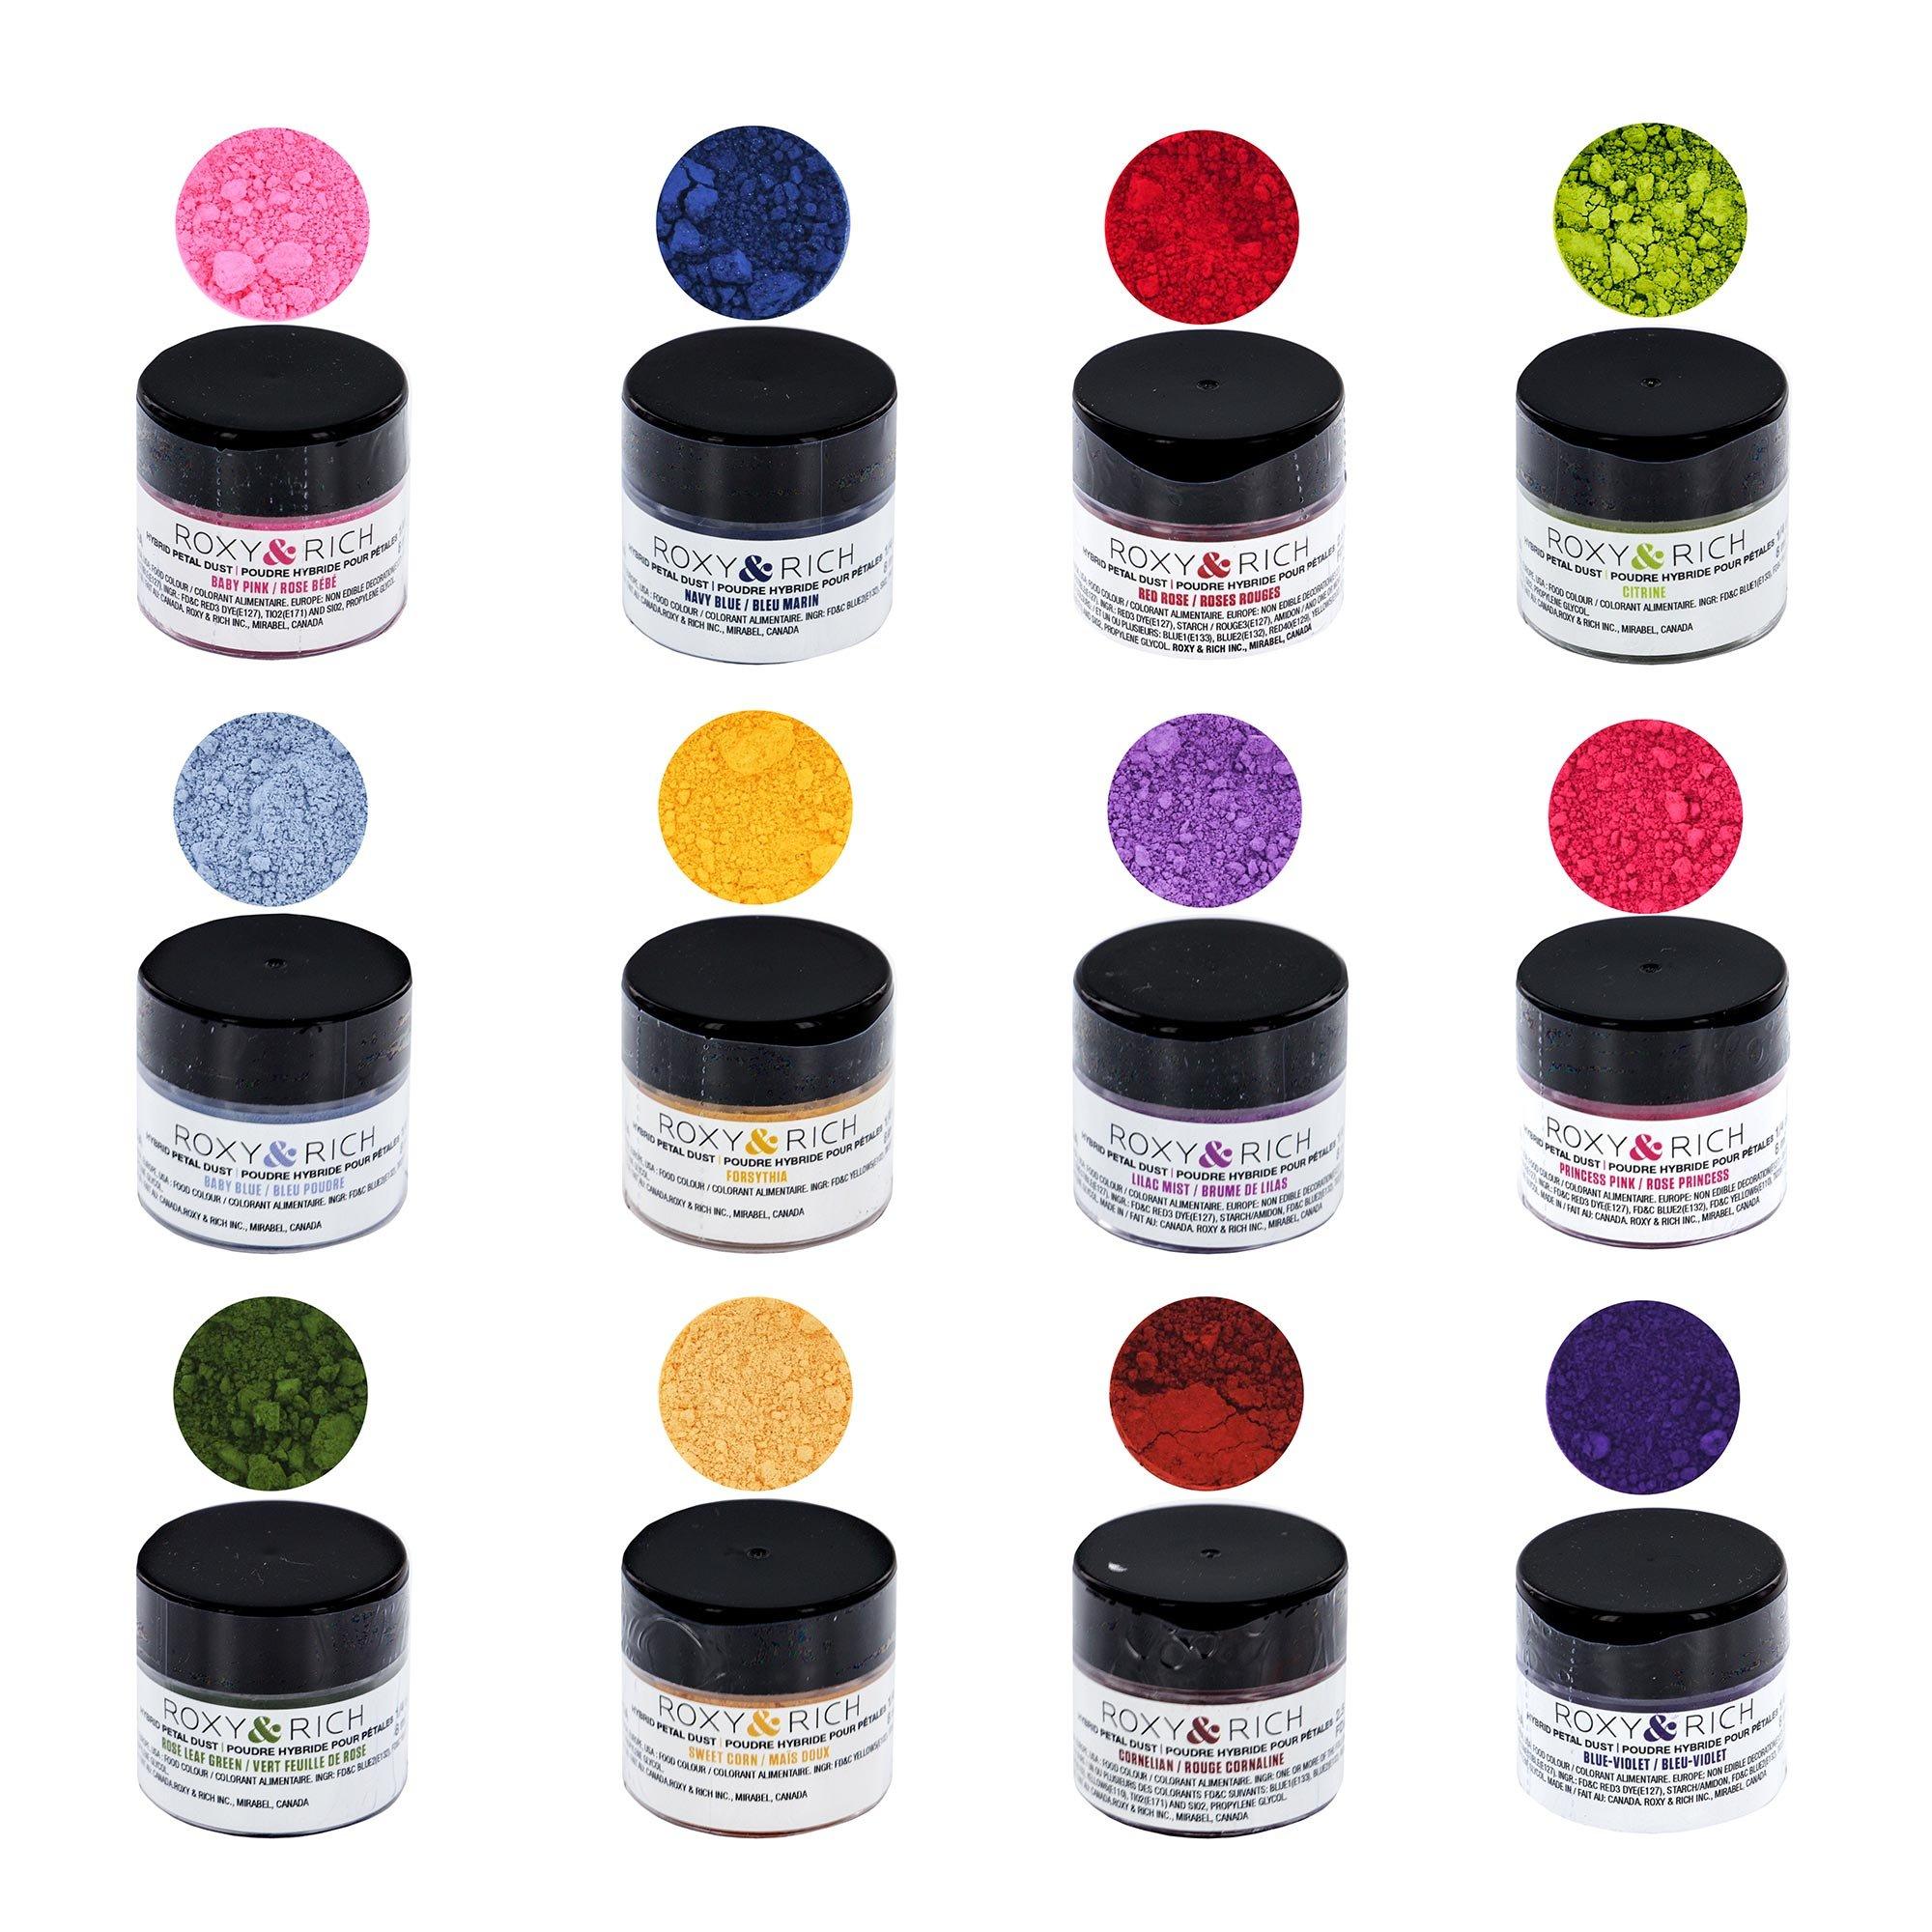 Roxy & Rich Edible Hybrid Petal Dust Professional Kit, 12 Colors by Global Sugar Art